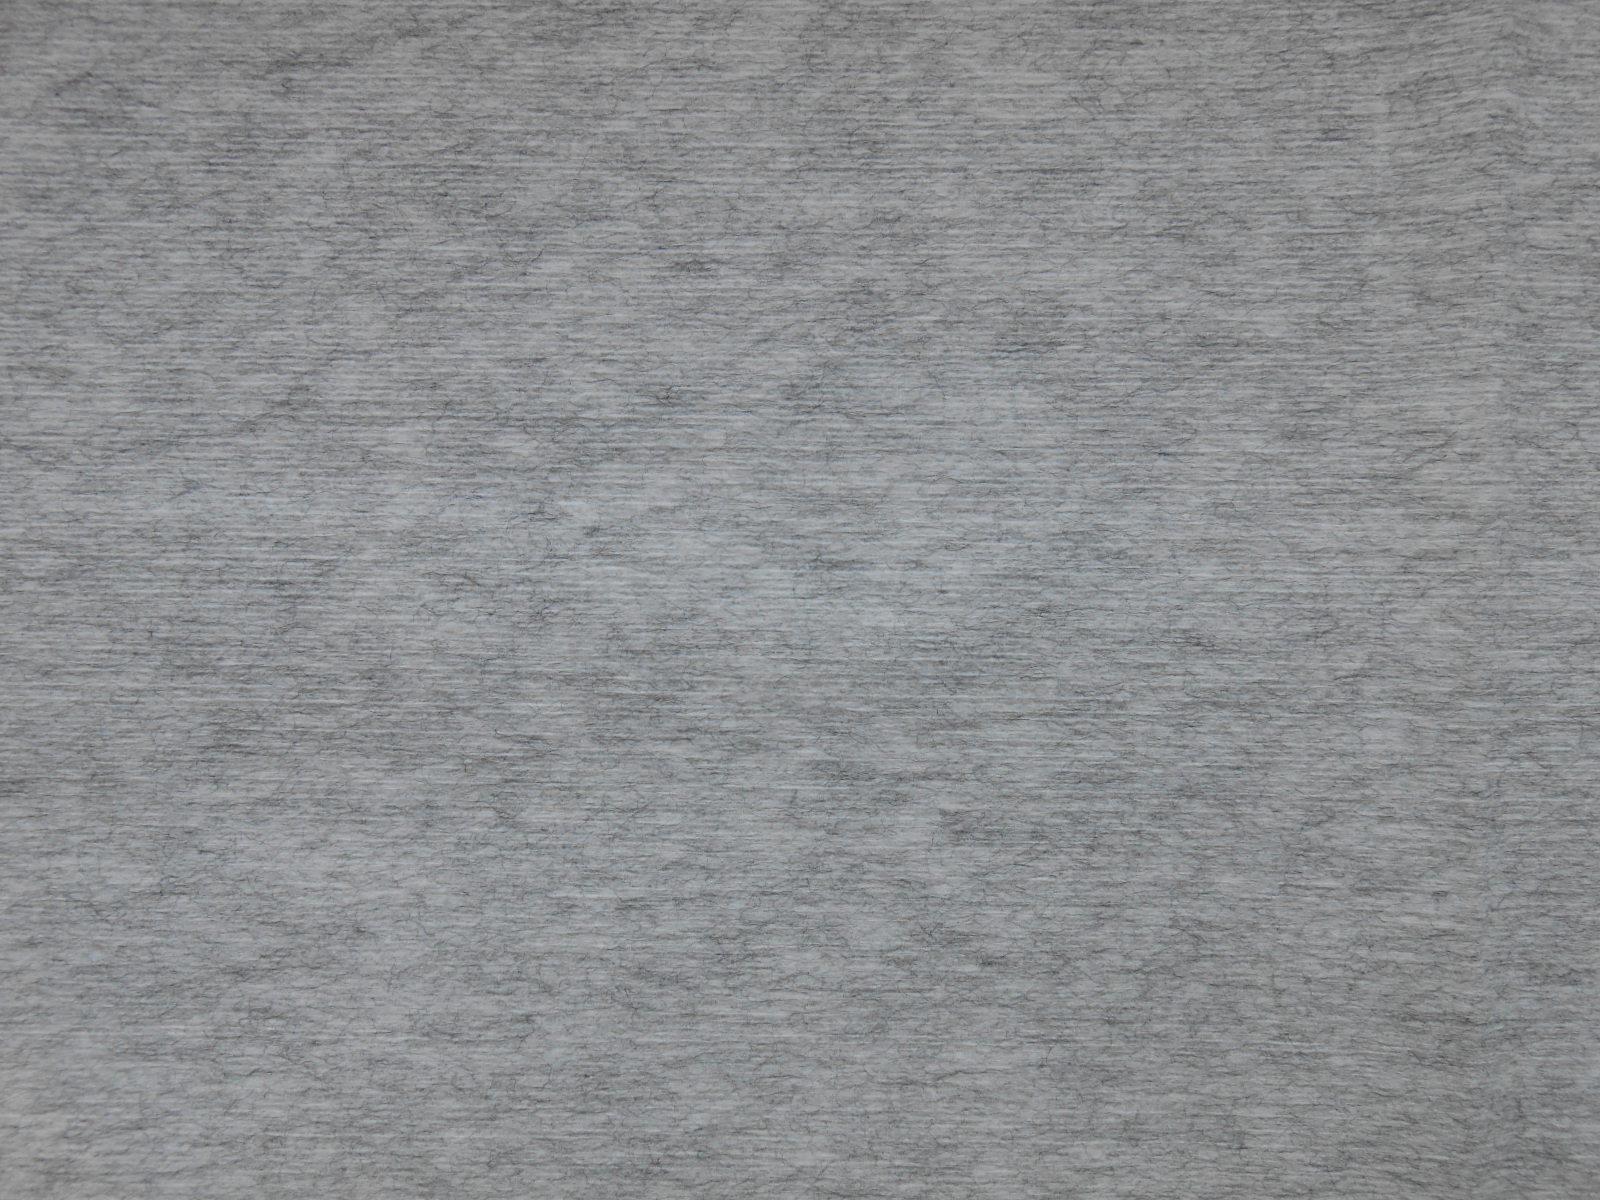 SOFTEXTRA grey rolldisp. 38x30cm 1x390sh